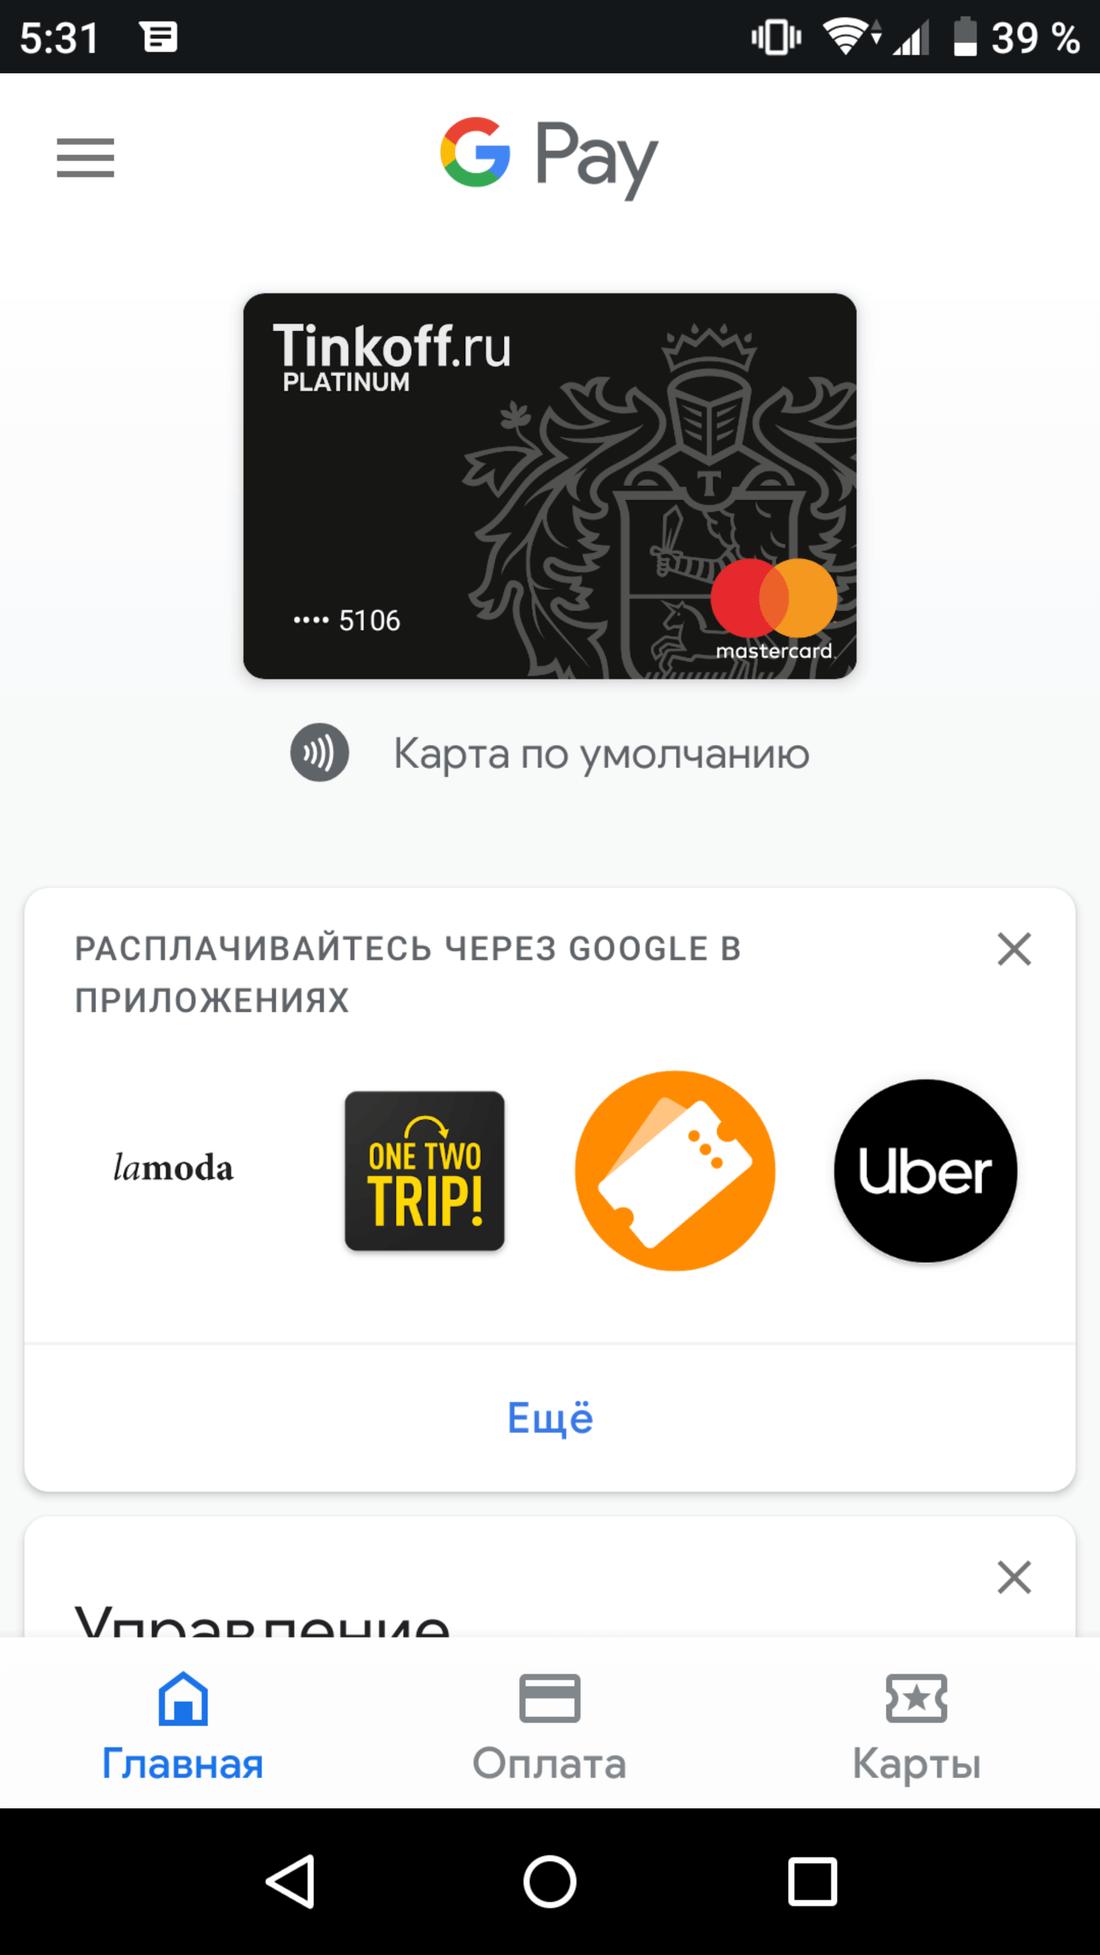 Скриншот #1 из программы Google Pay